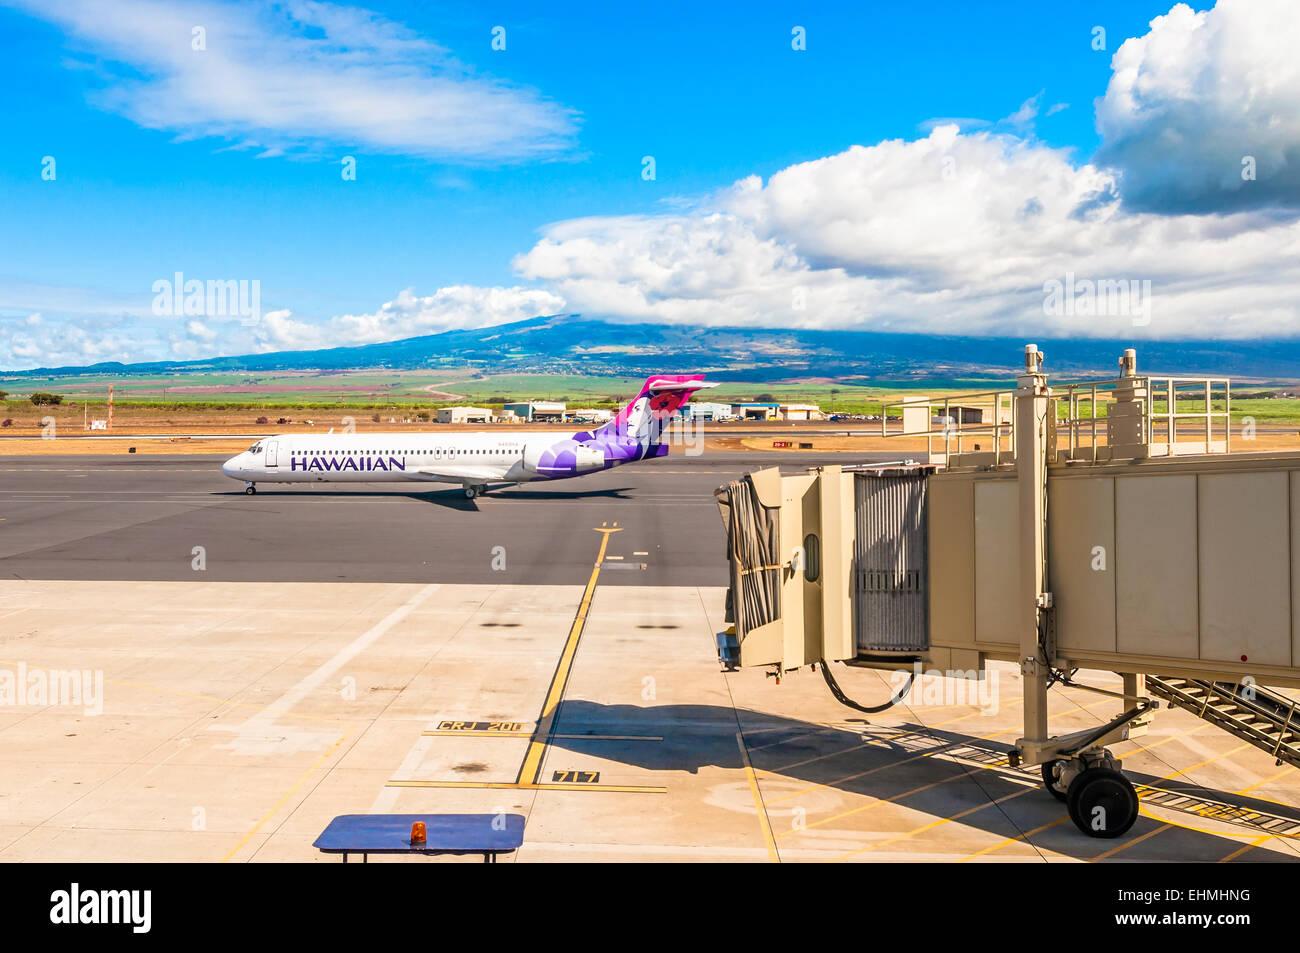 Kahului, HI, USA - September 5, 2013: Hawaiian Airline Boeing 717-200 at Kahului Airport in Maui, Hawaii. Hawaiian - Stock Image